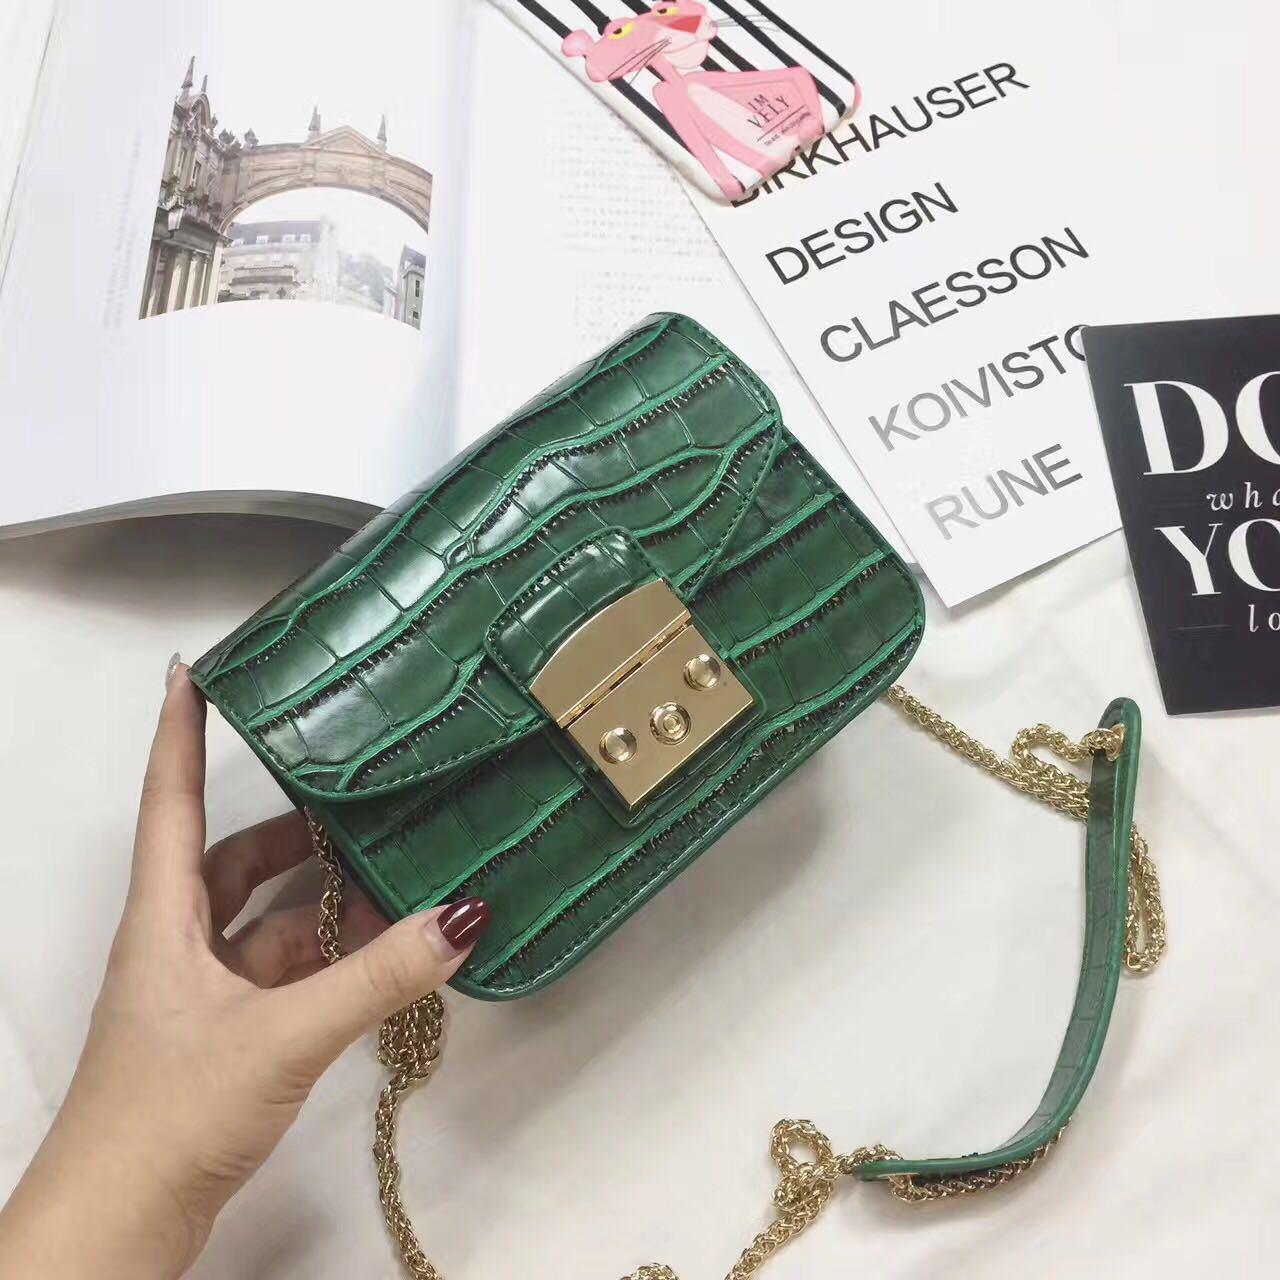 Crocodile pattern Pu Leather Women Hangbag Crossbody Messenger Bags Small Bag Ladies Travel Chains Shoulder Bags Storage Bag